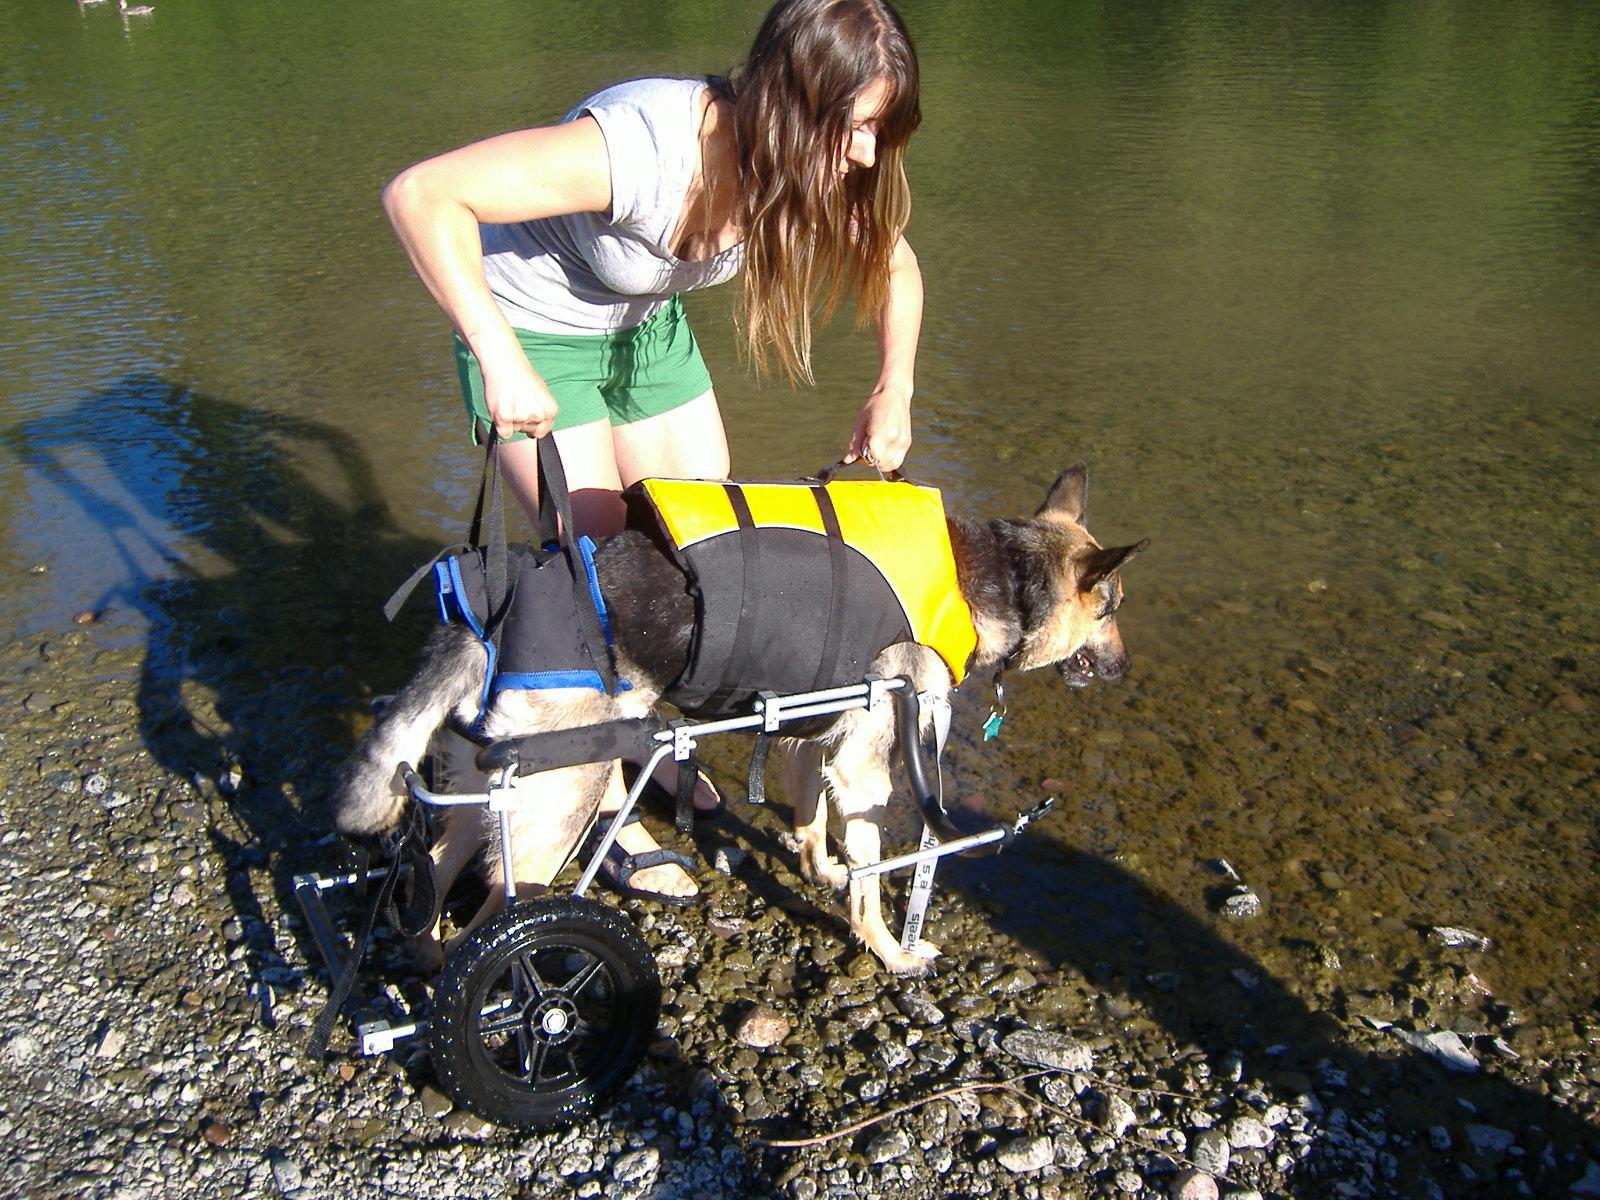 River Swimming - Alec's Story